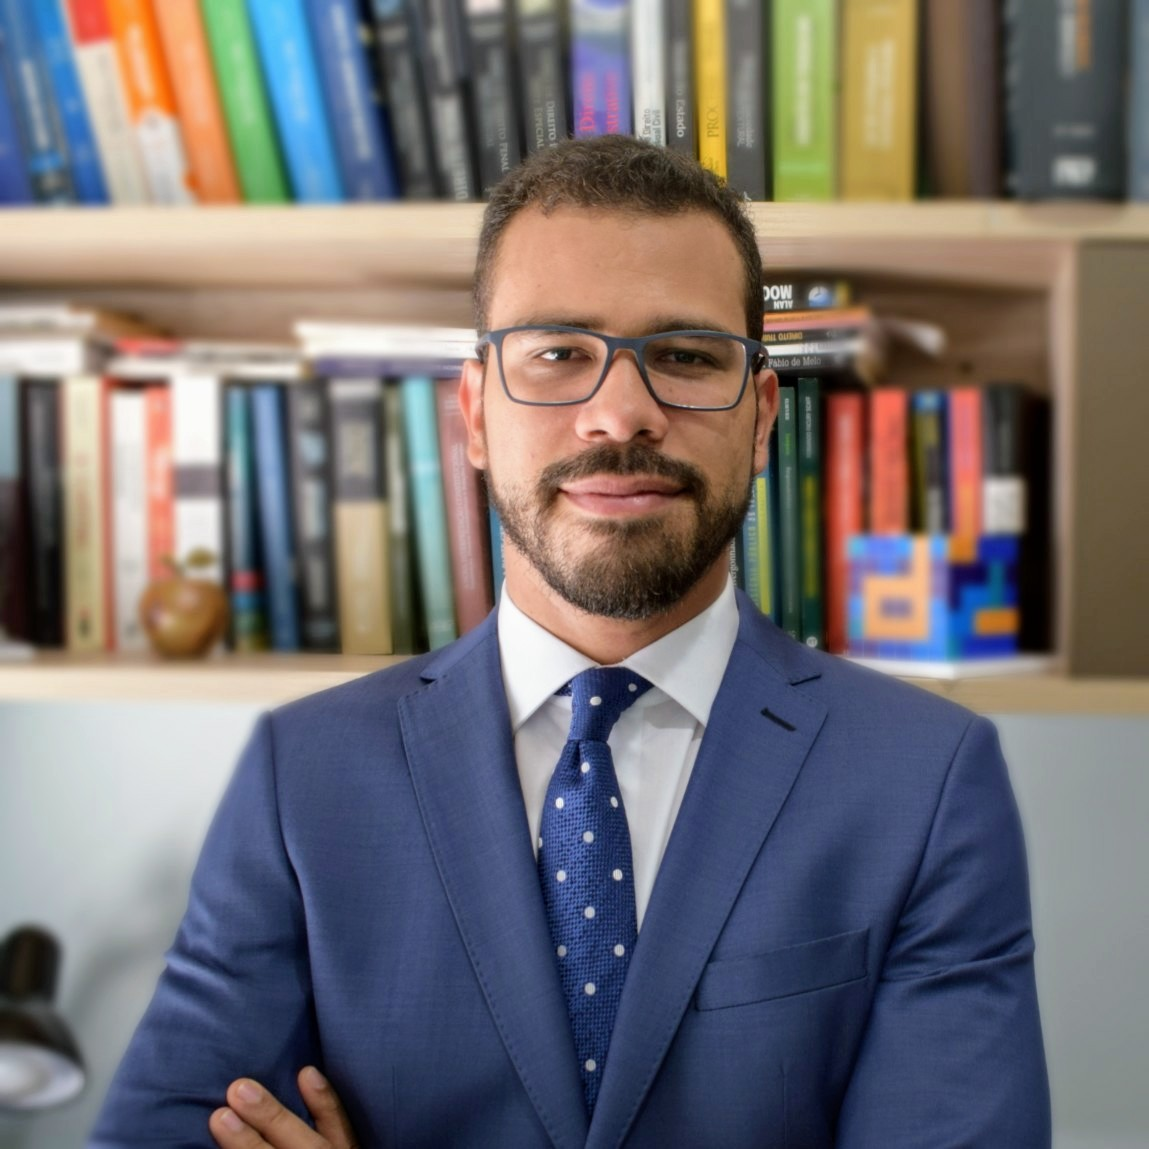 Cássio Bruno Castro Souza